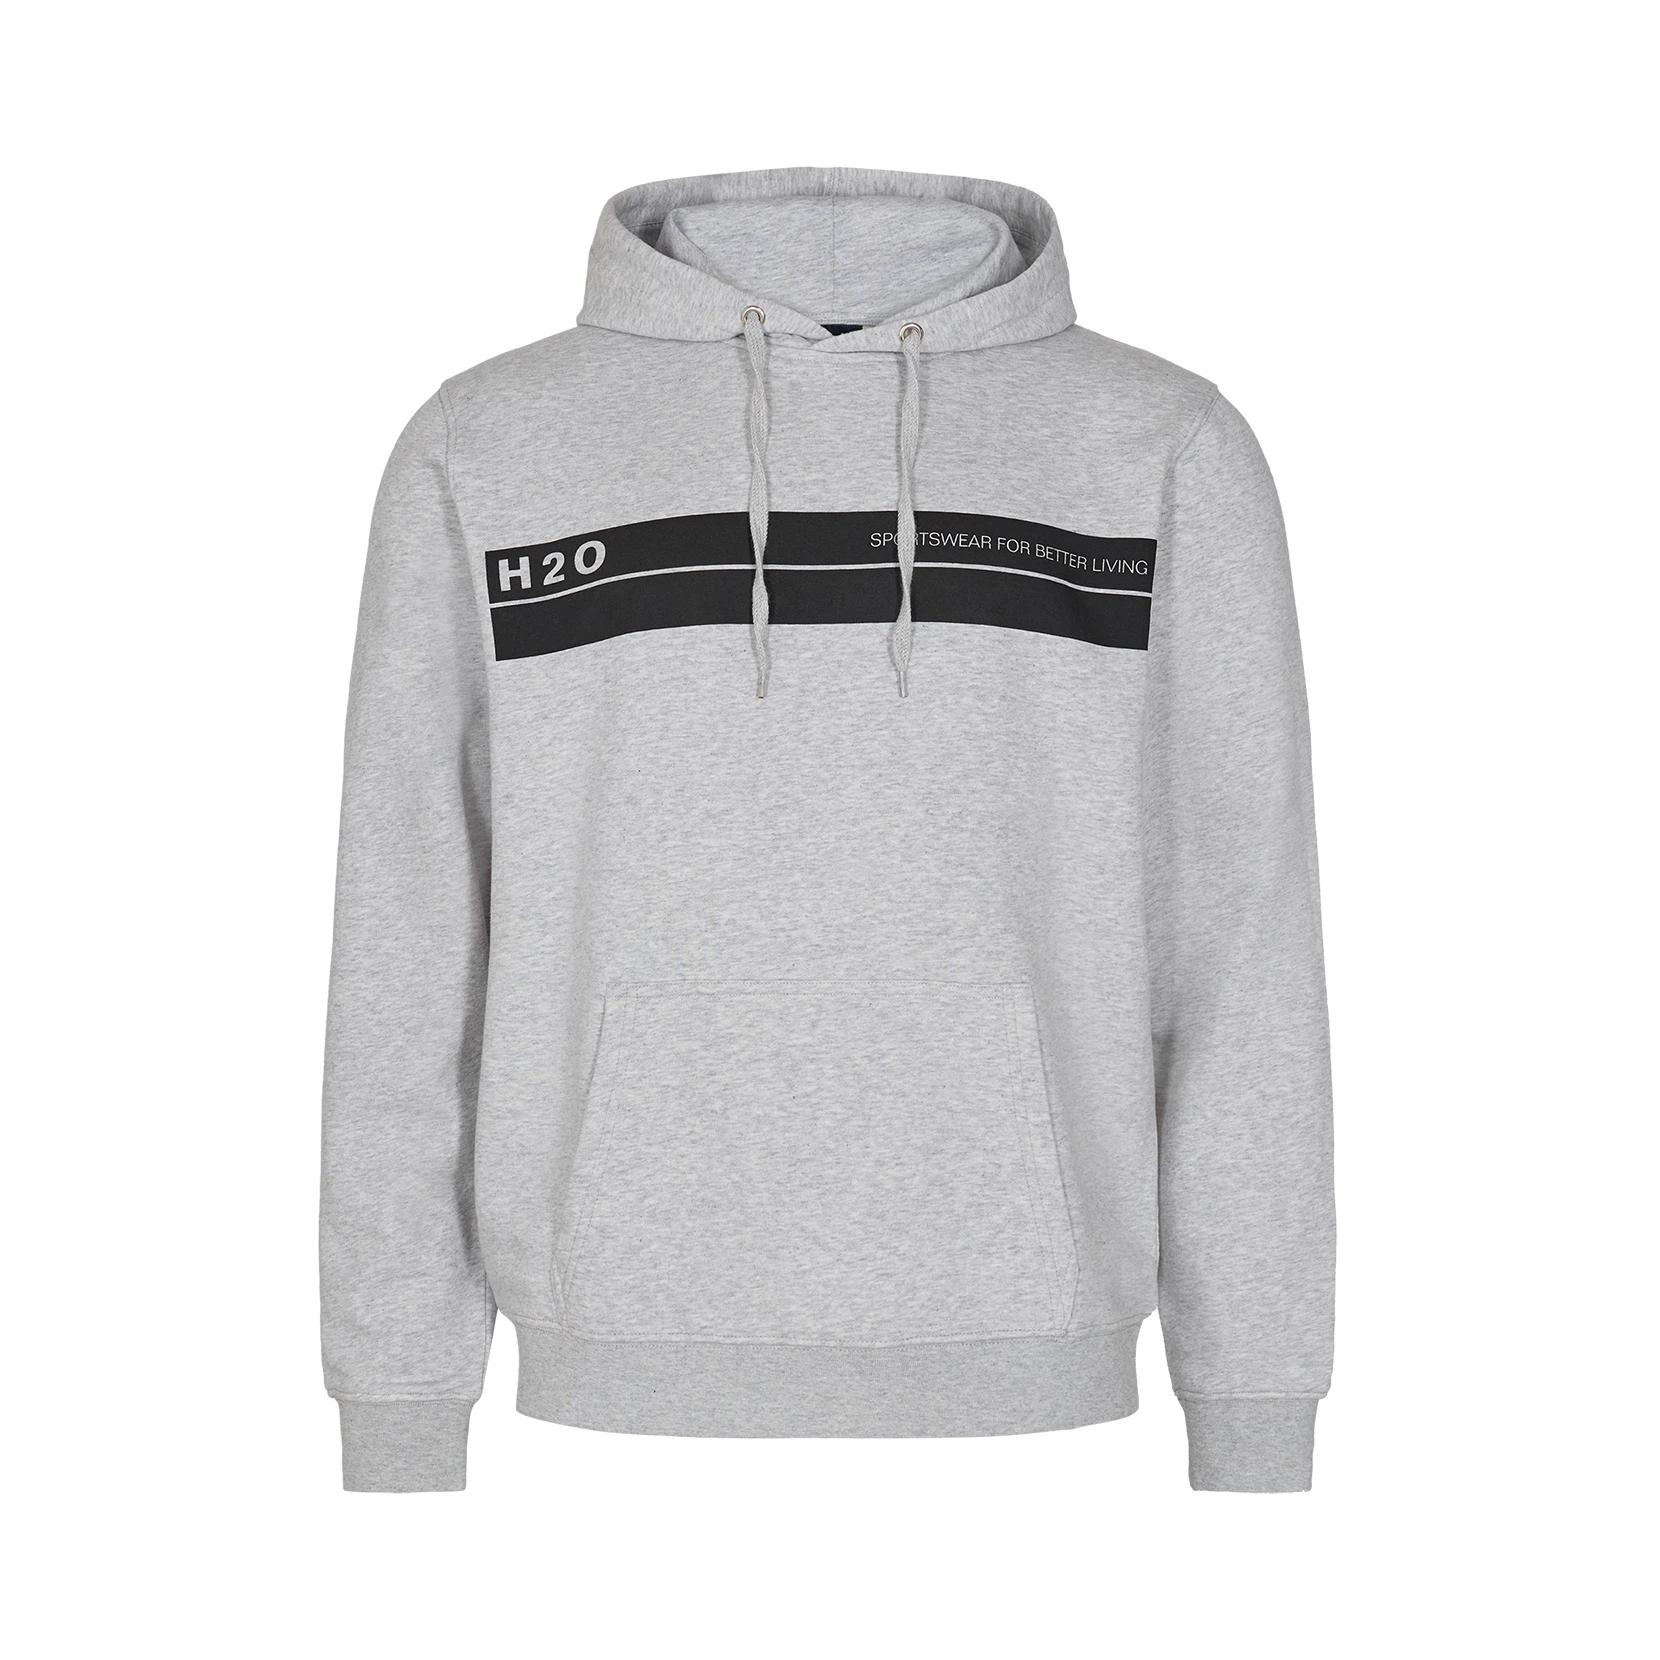 H2O Mandø hoodie